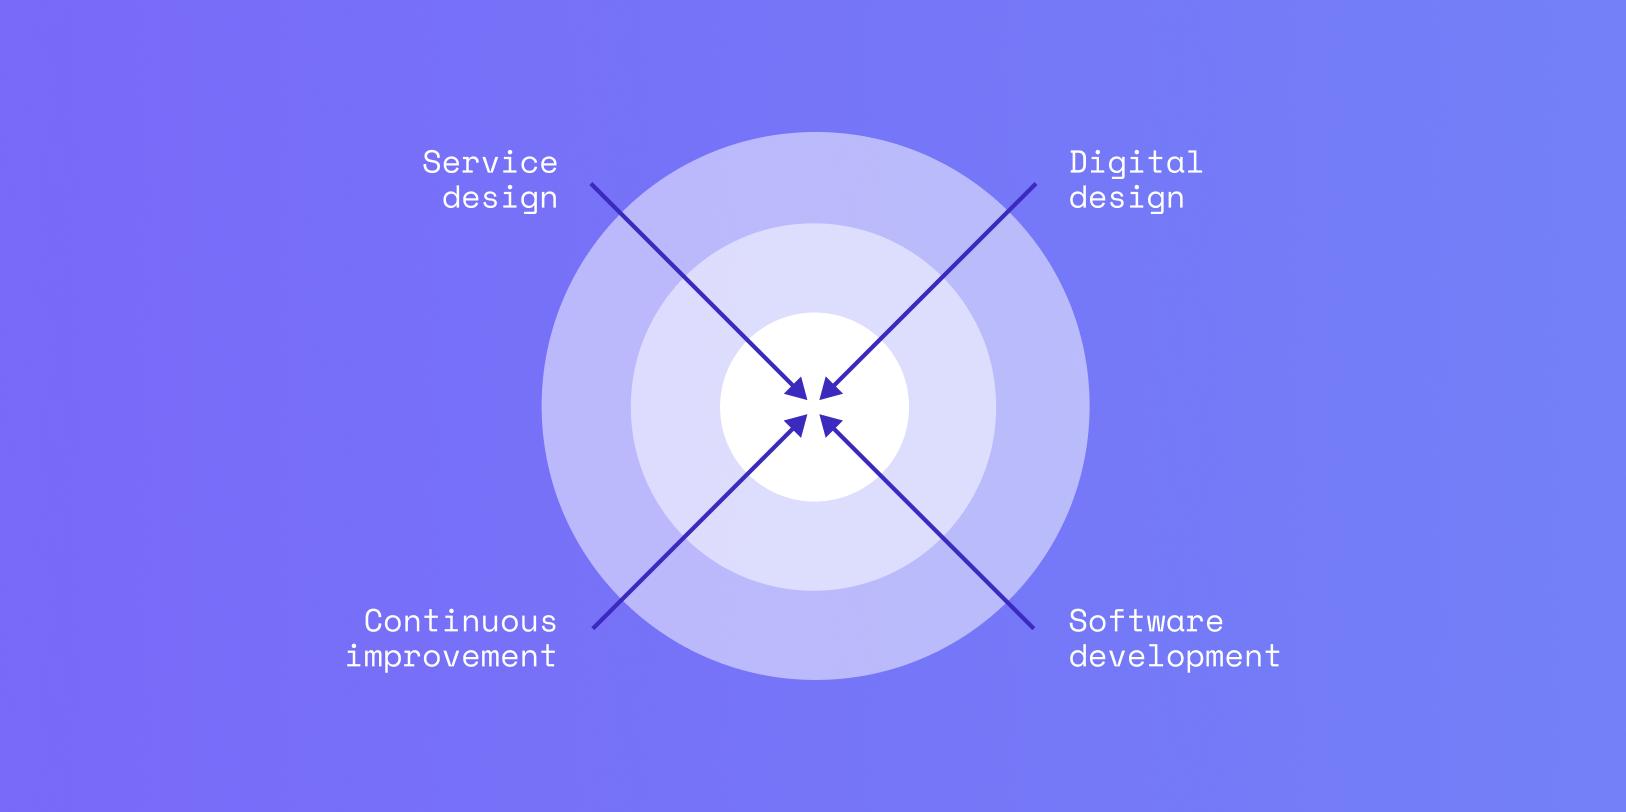 Taiste's services: Service Design, Digital Design, Continuous Improvement and Software Development.